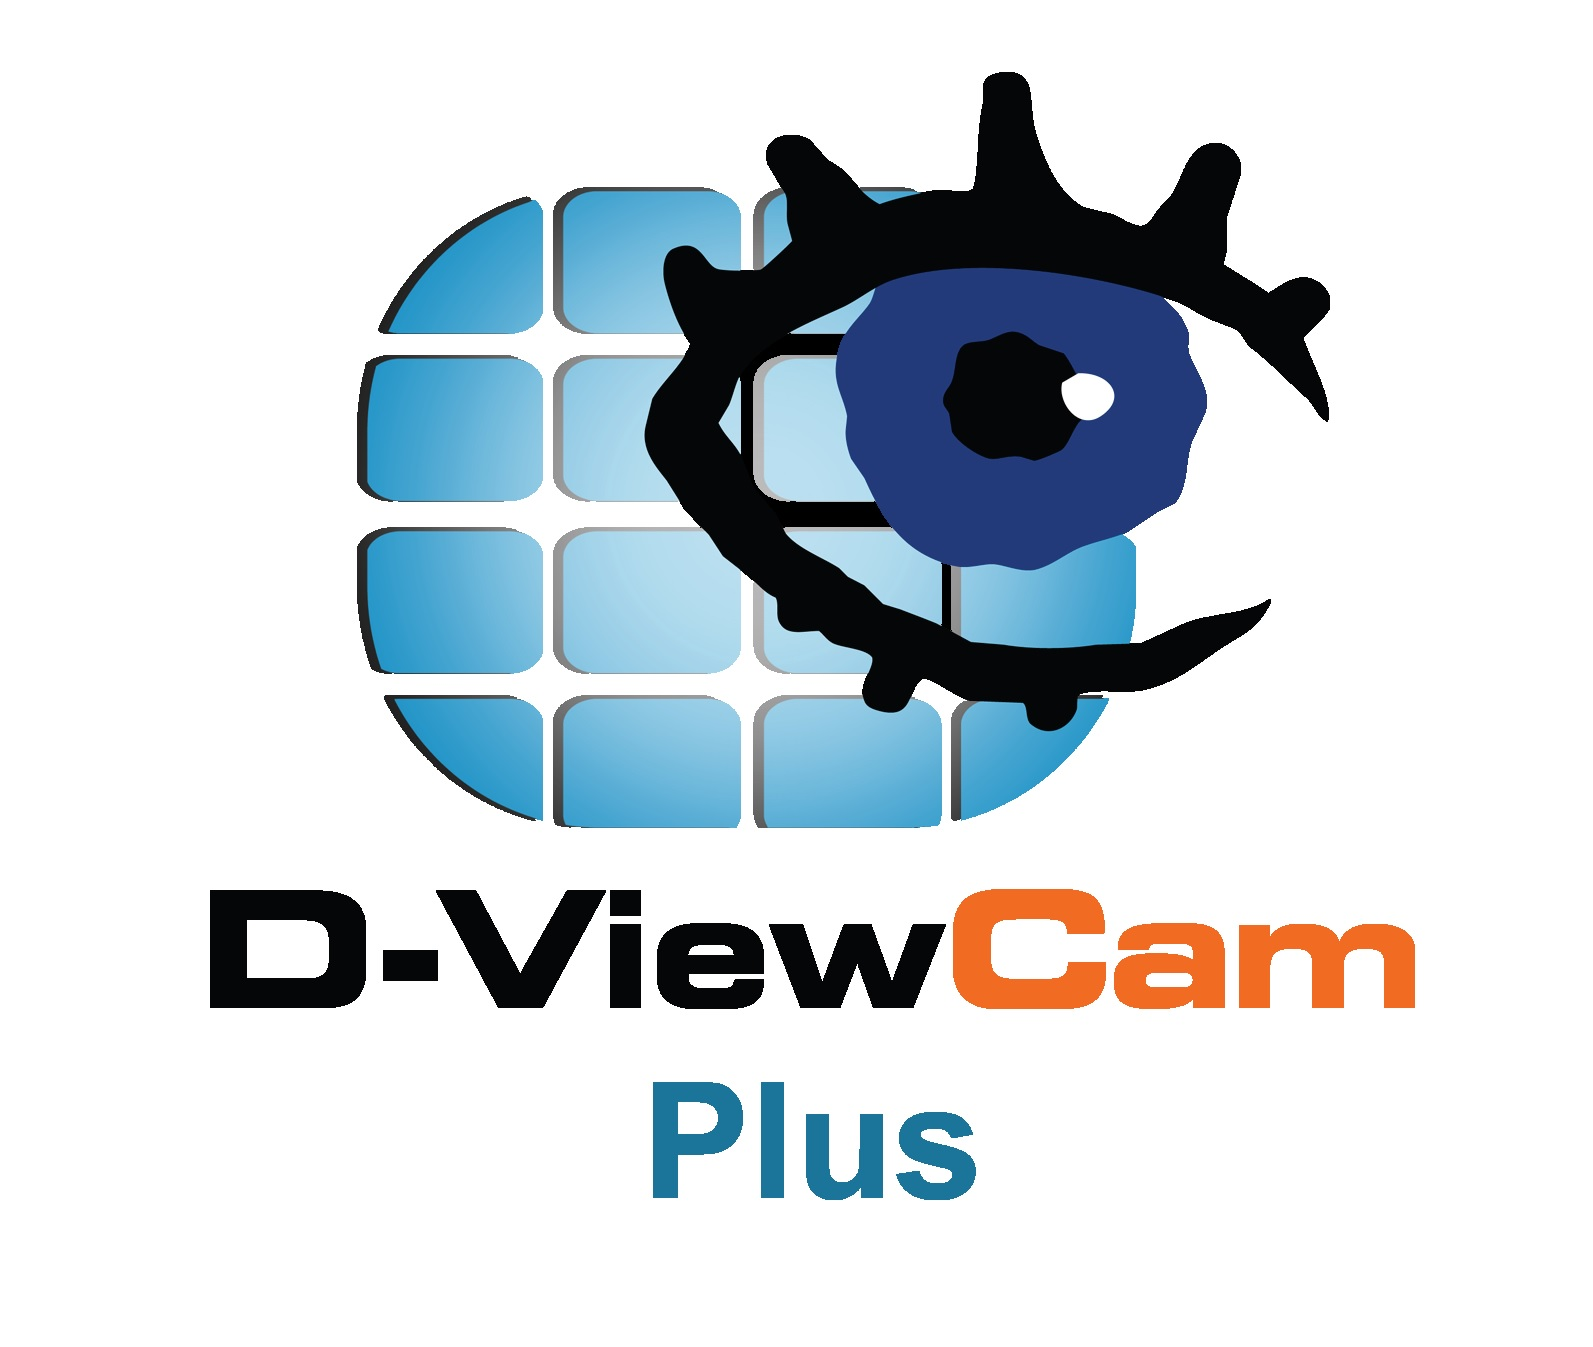 d link viewcam